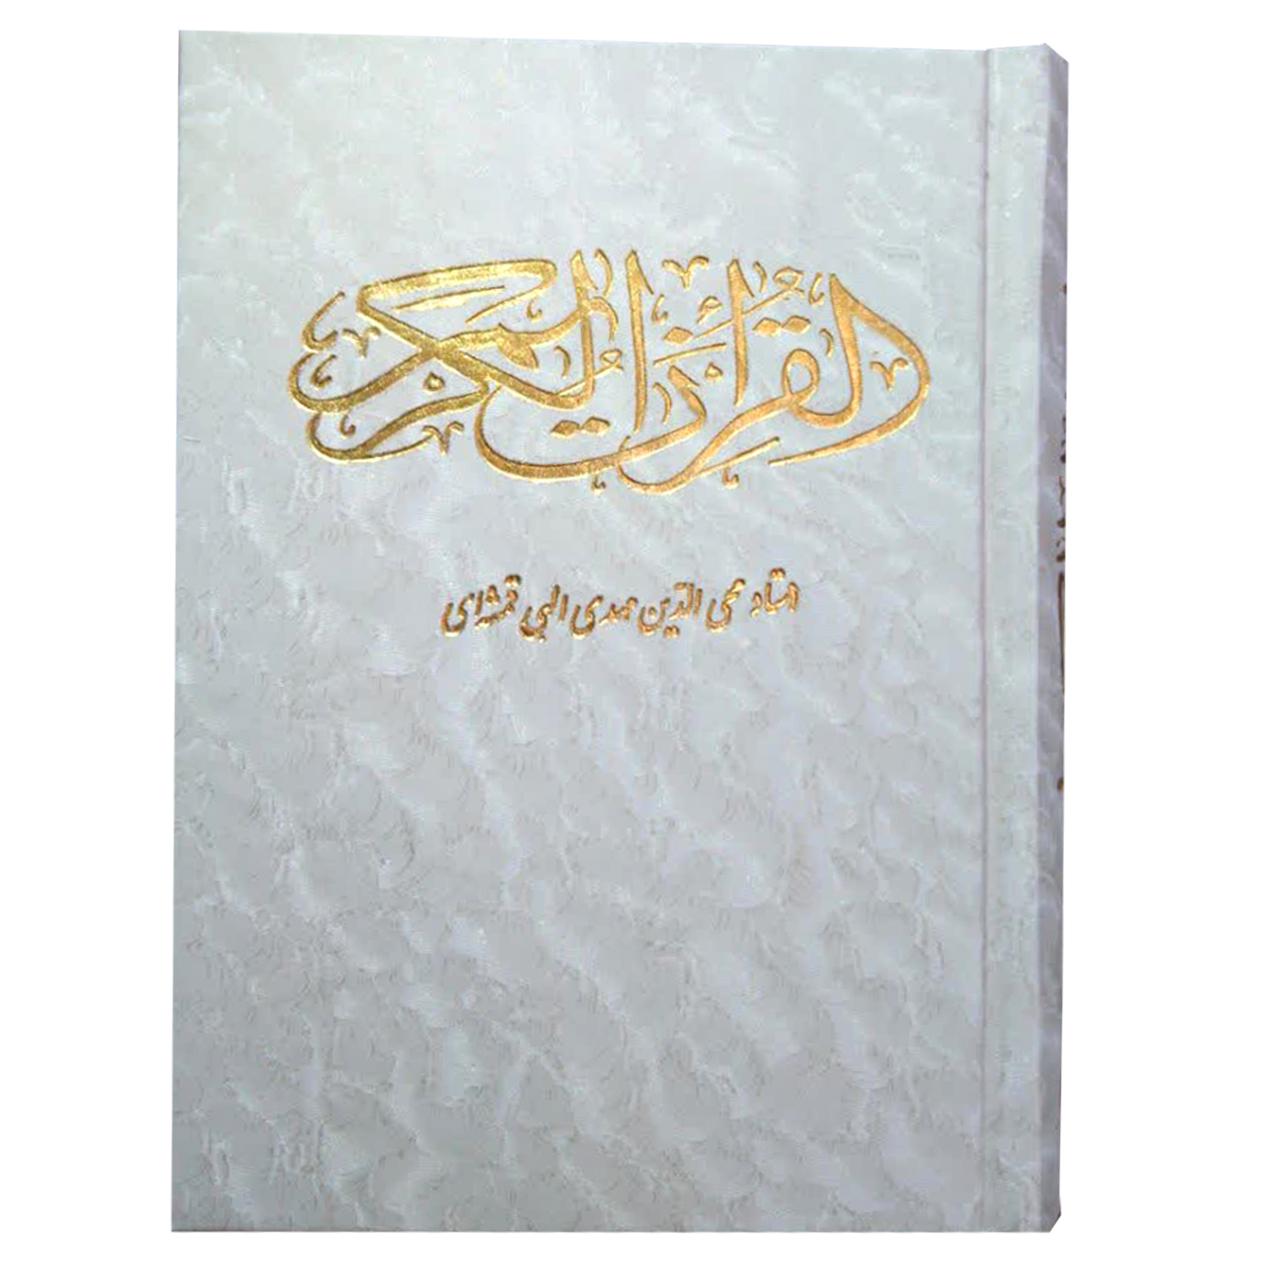 کتاب قرآن کریم ترجمه مهدی الهی قمشه ای انتشارات قلم و اندیشه کد08